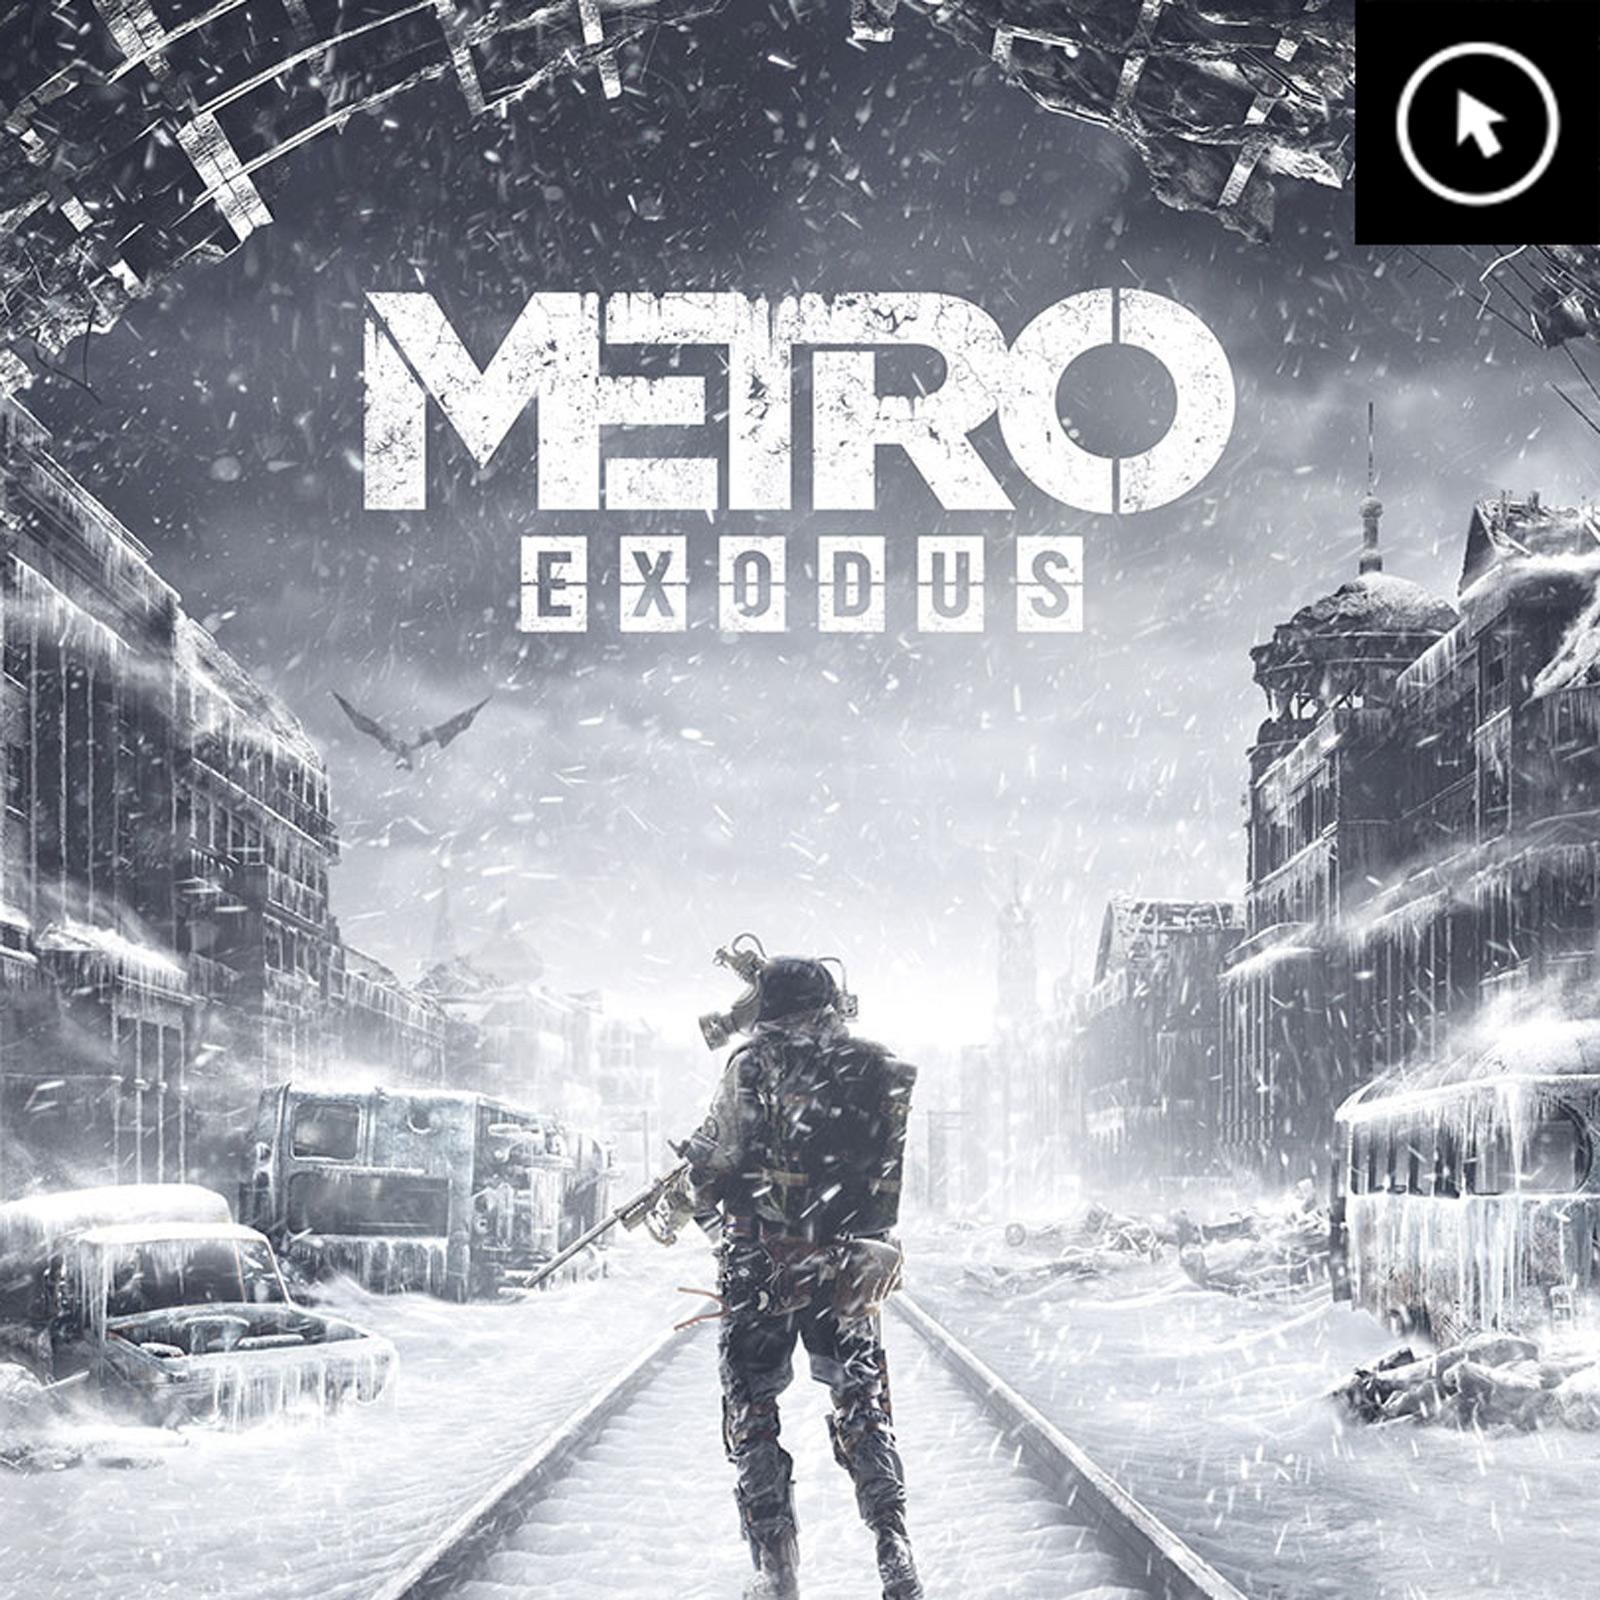 Video Game Review: Metro Exodus - Peer Magazine | The